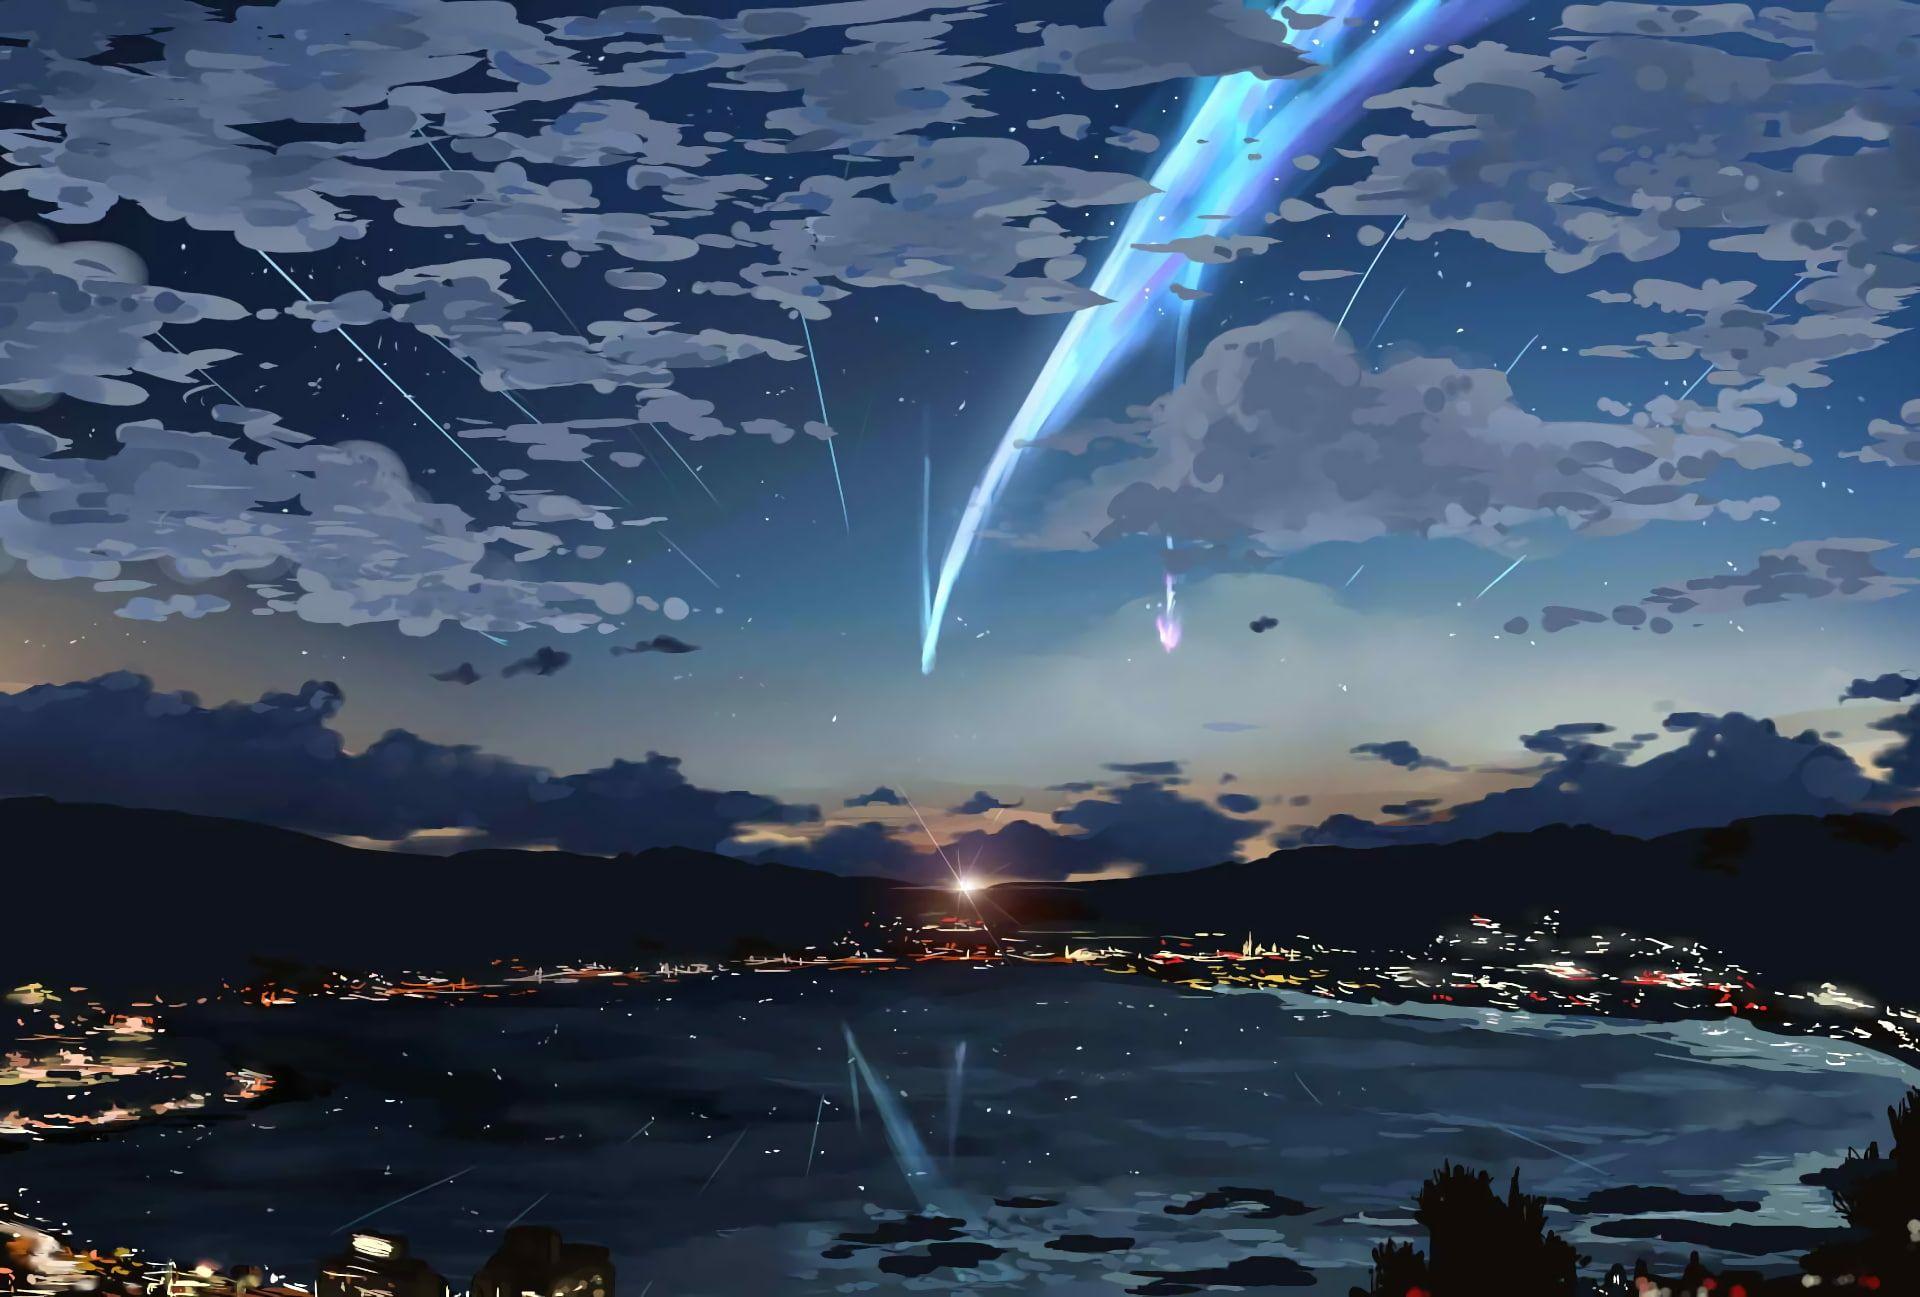 Body Of Water Your Name Sky Stars Kimi No Na Wa Lights Anime 1080p Wallpaper Hdwallpaper De Kimi No Na Wa Wallpaper Your Name Wallpaper Your Name Anime